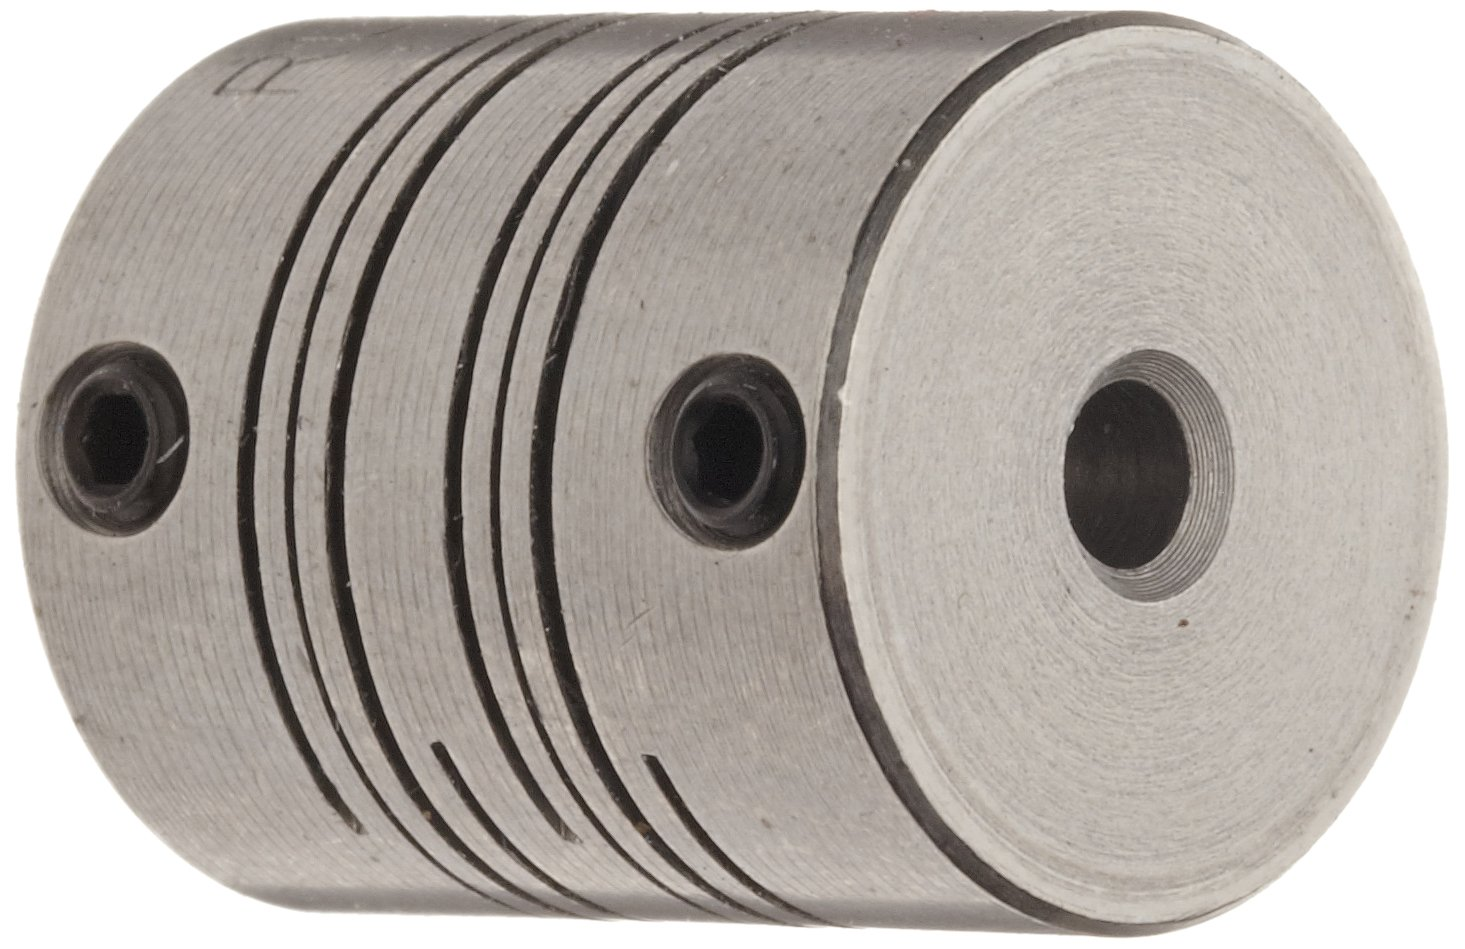 Stainless Steel 2-1//4 Length Inch 5//8 Bore A Diameter 3//8 Bore B Diameter 1-1//2 OD 175 lb-in Nominal Torque Ruland FSR24-10-6-SS Set Screw Beam Coupling